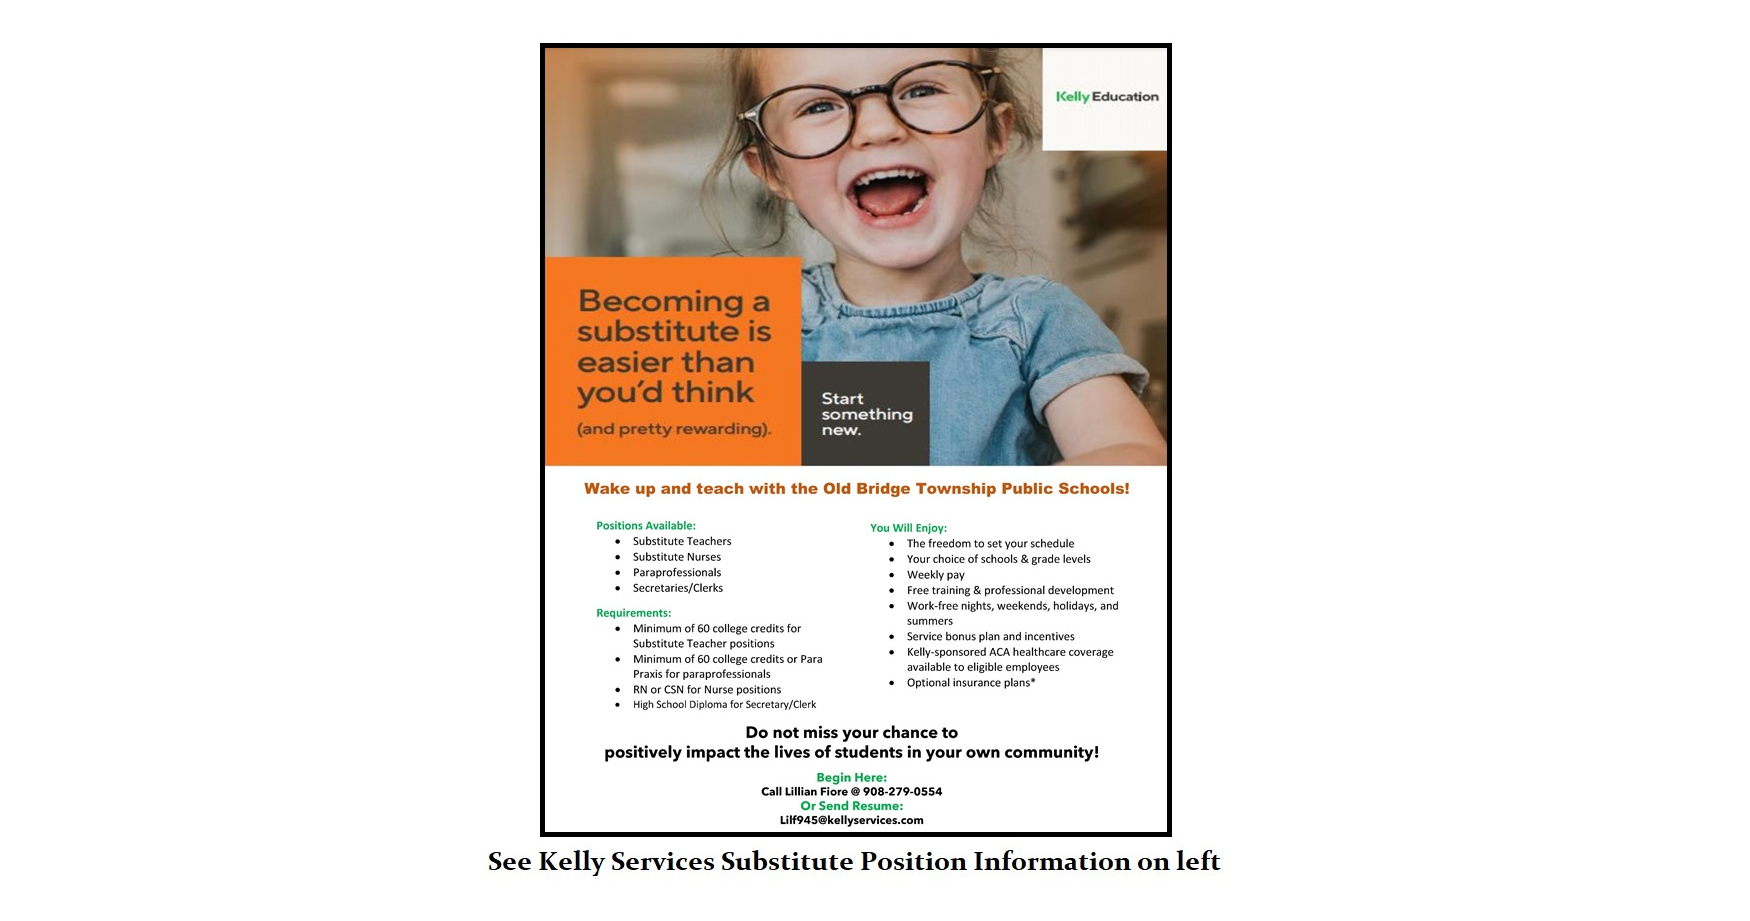 kelly services flyer